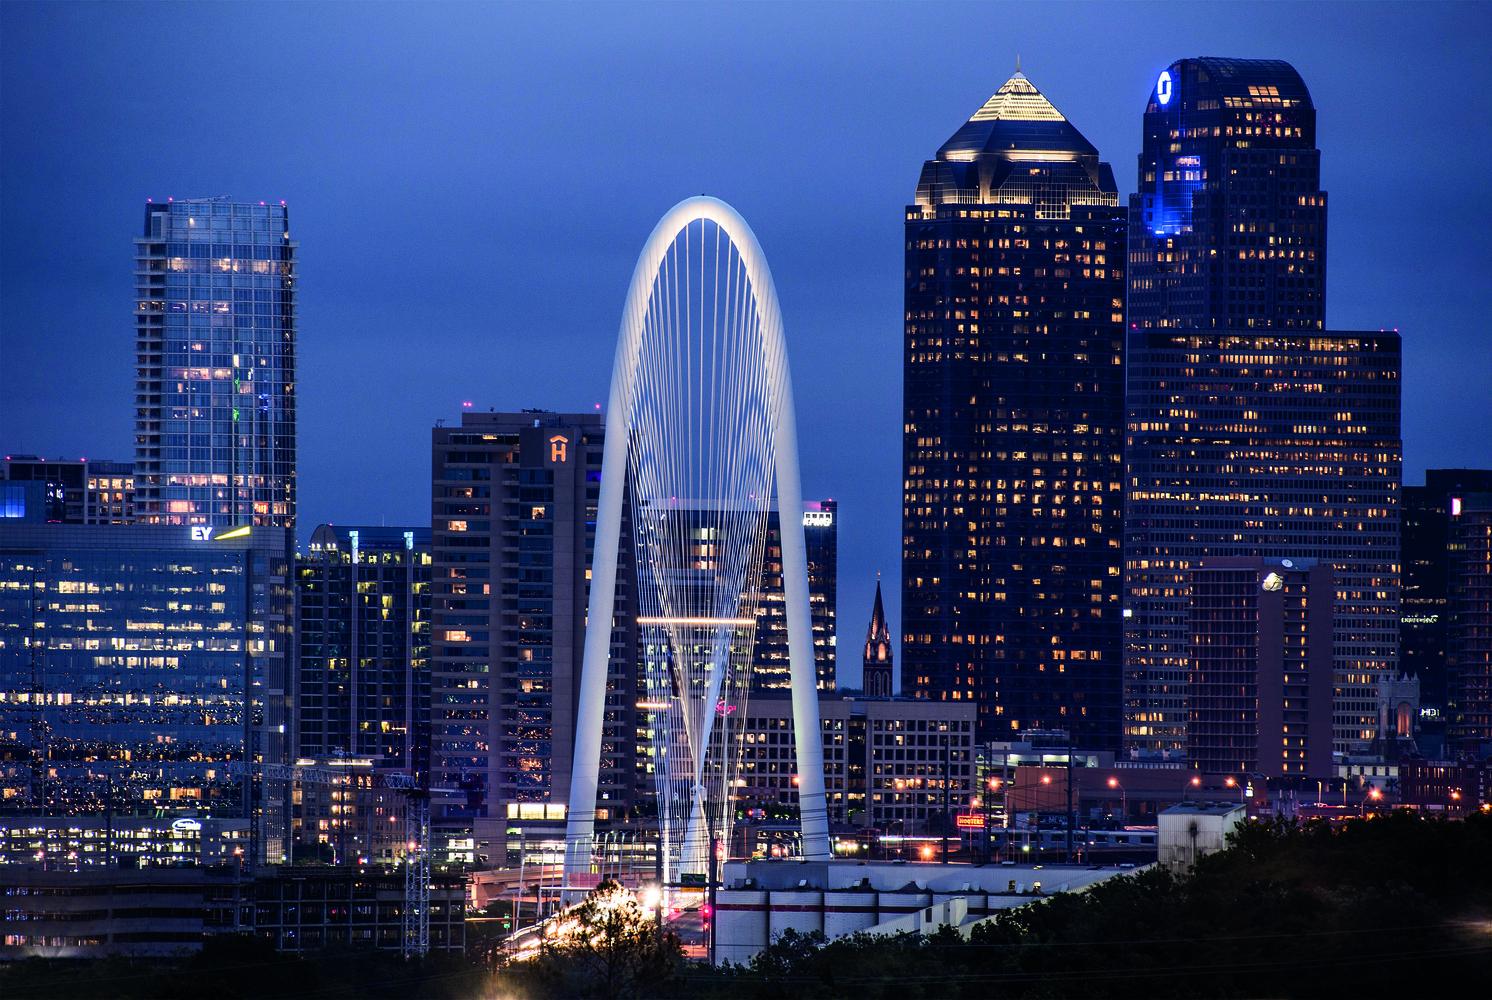 RS_Margaret_Hunt_Hill_Bridge__Dallas__Texas.jpg